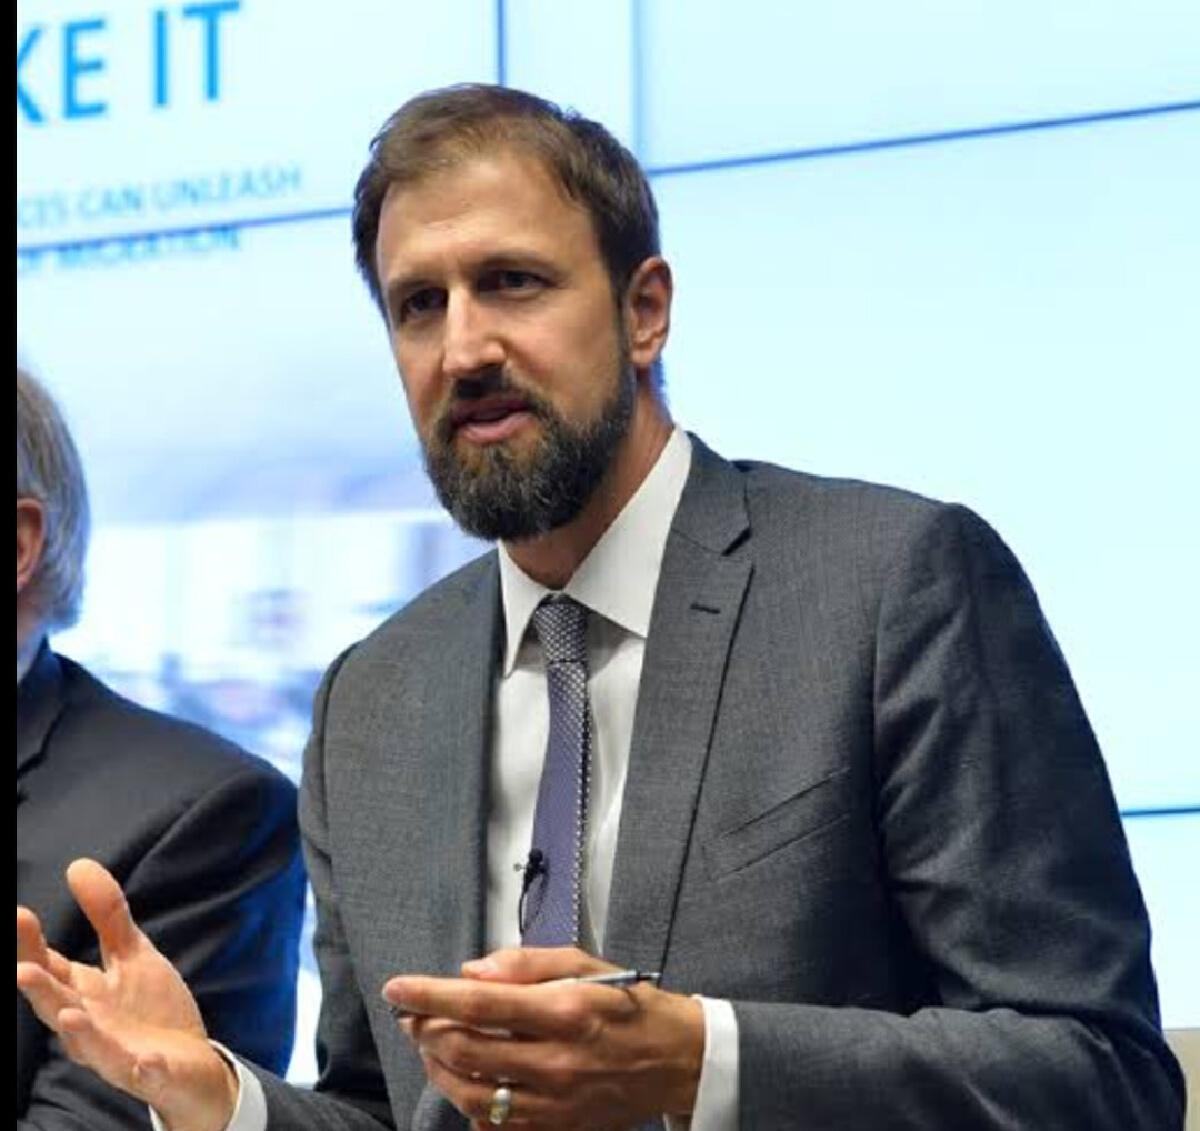 the head of the United States Agency for International Development Covid-19 task force Jeremy Konyndyk